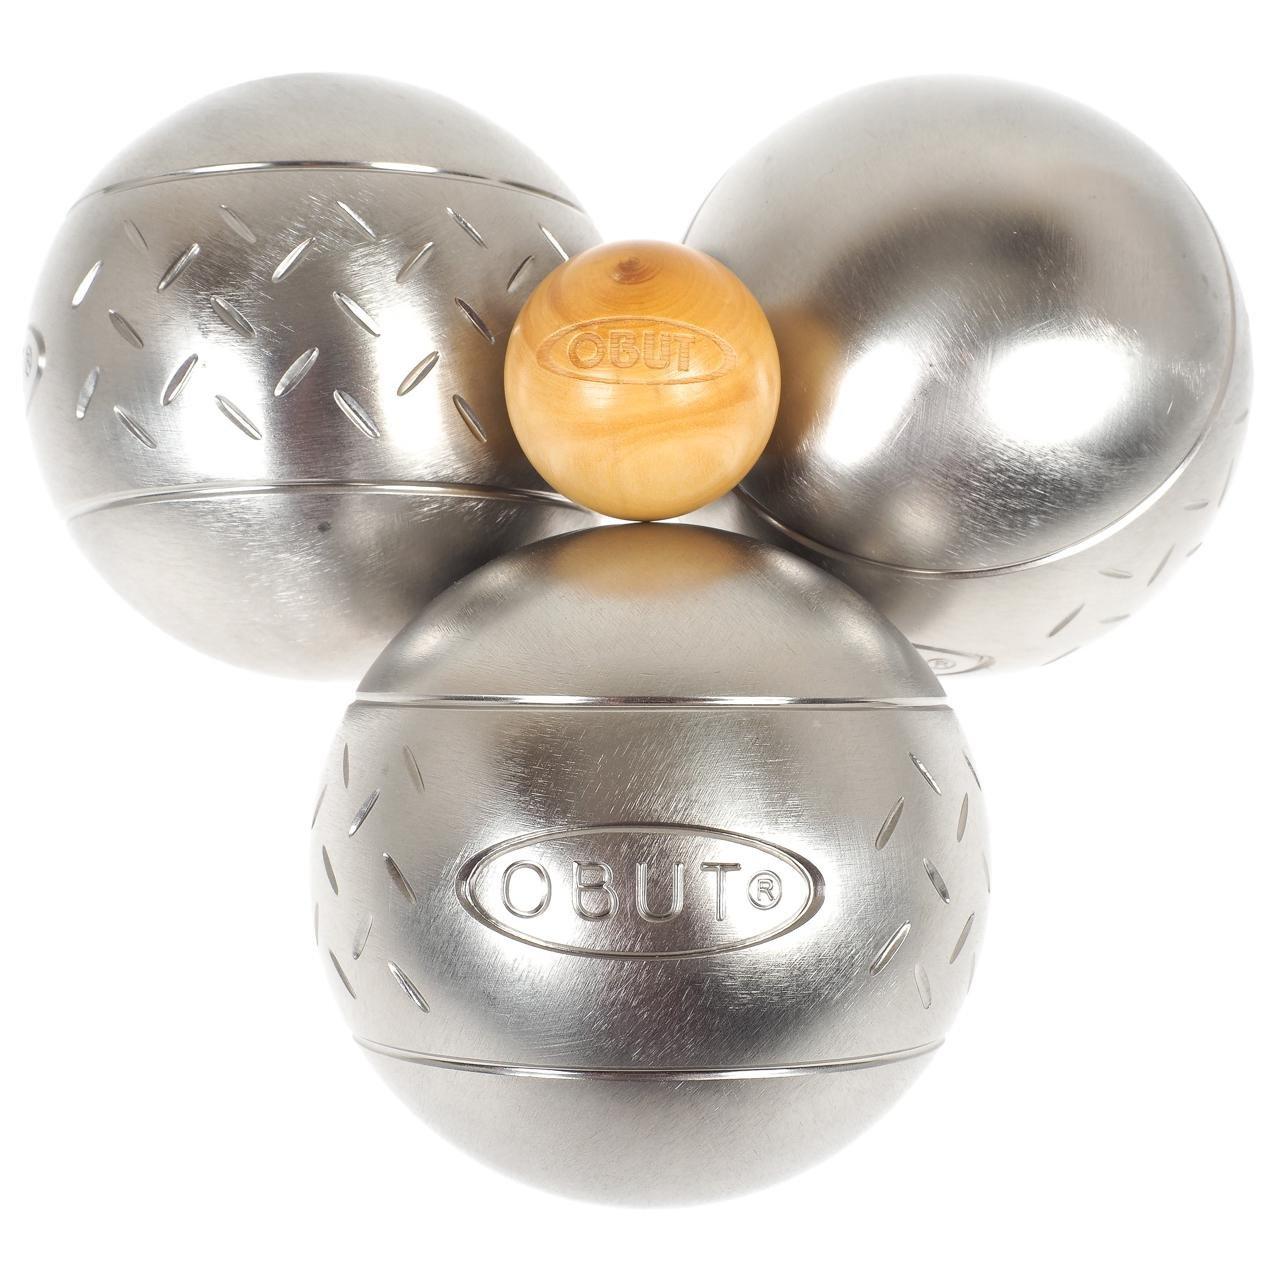 Obut Loisir inox SUN Chevron, jeu de 3 boules product image